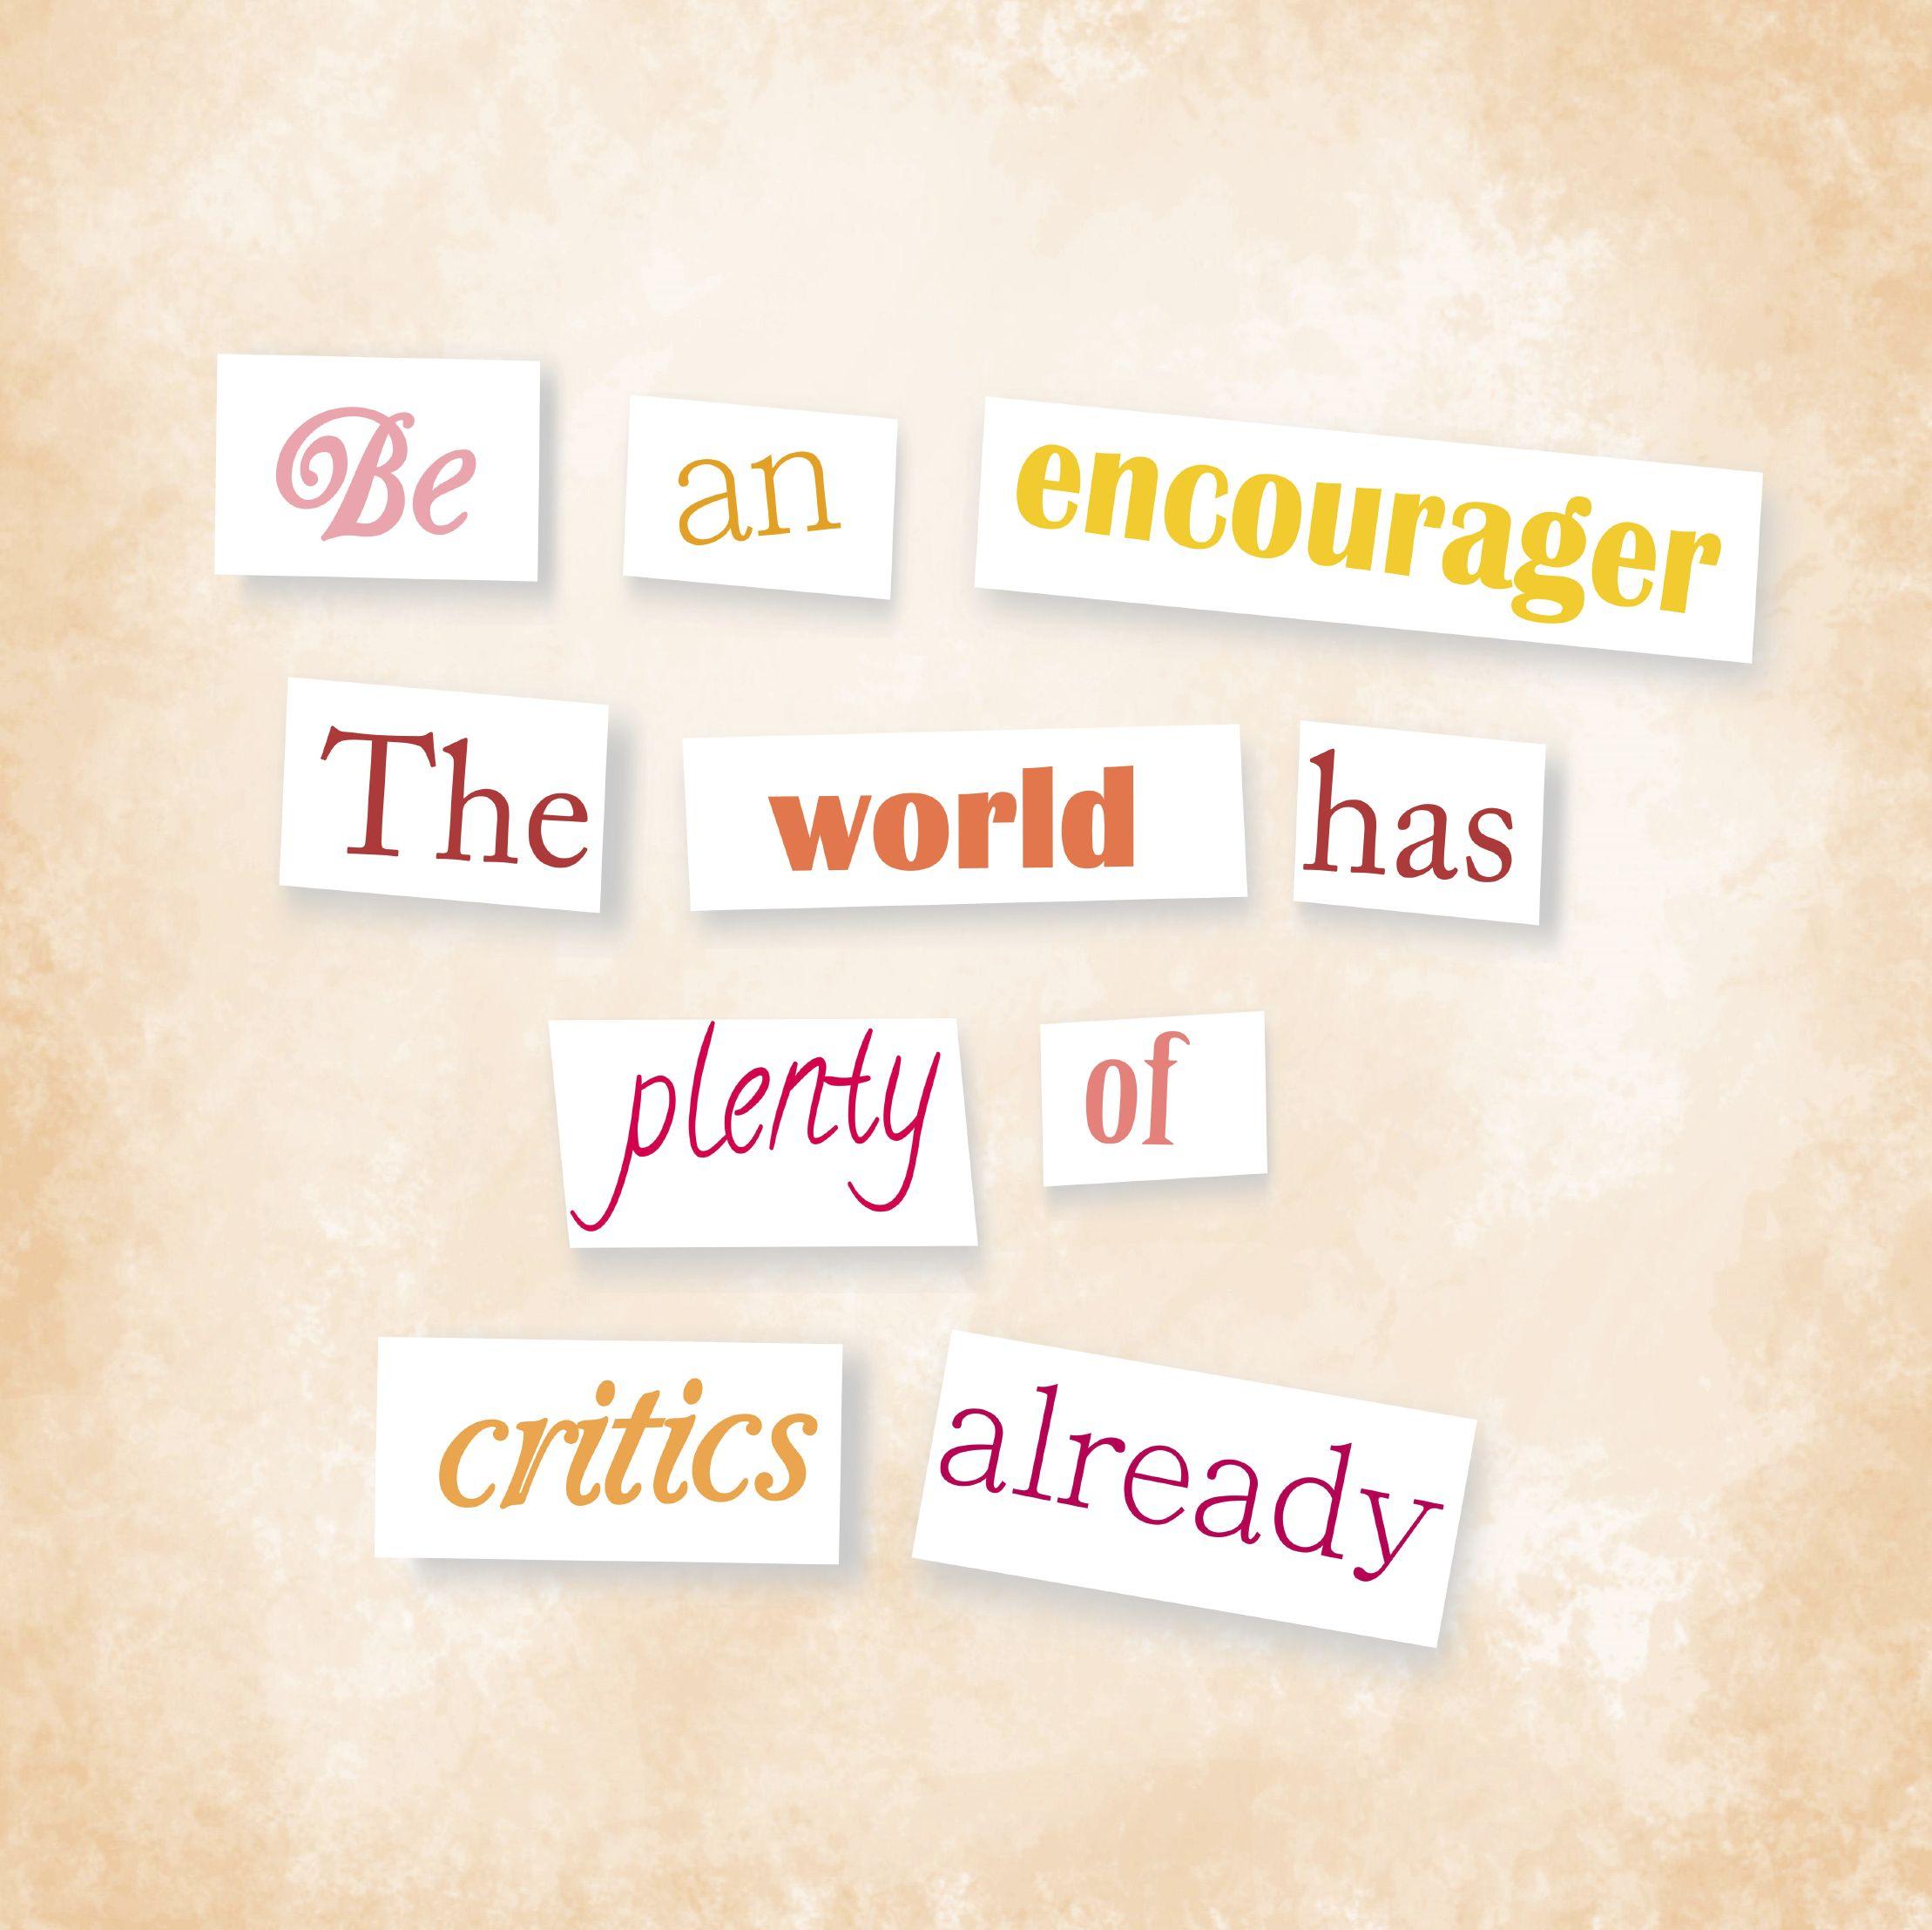 Be an encourager the world has plenty of critics already